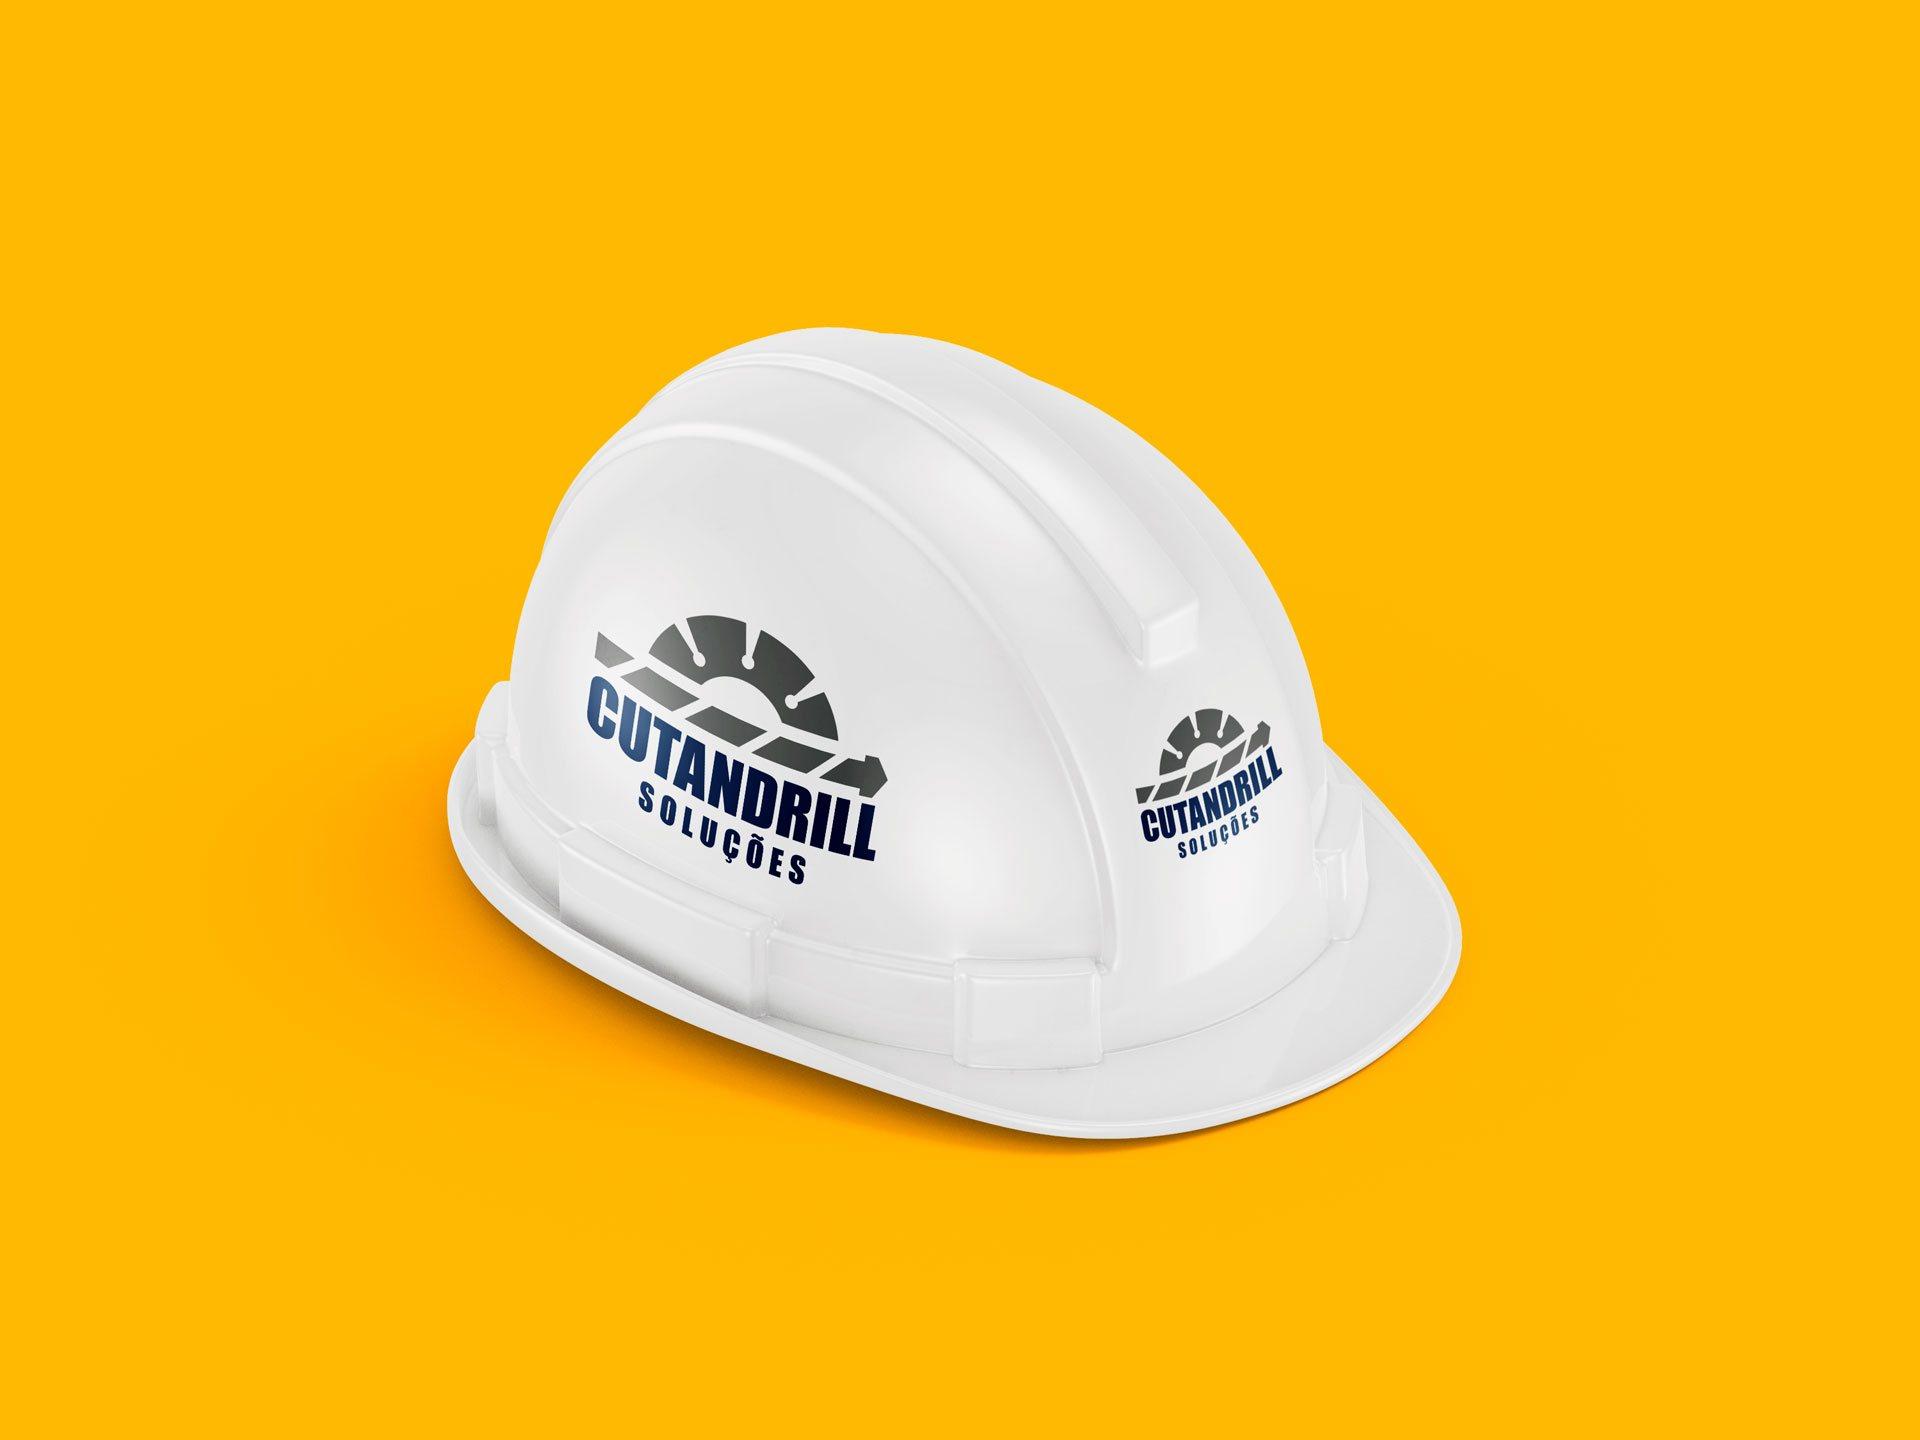 Cutandrill Capacete Construção